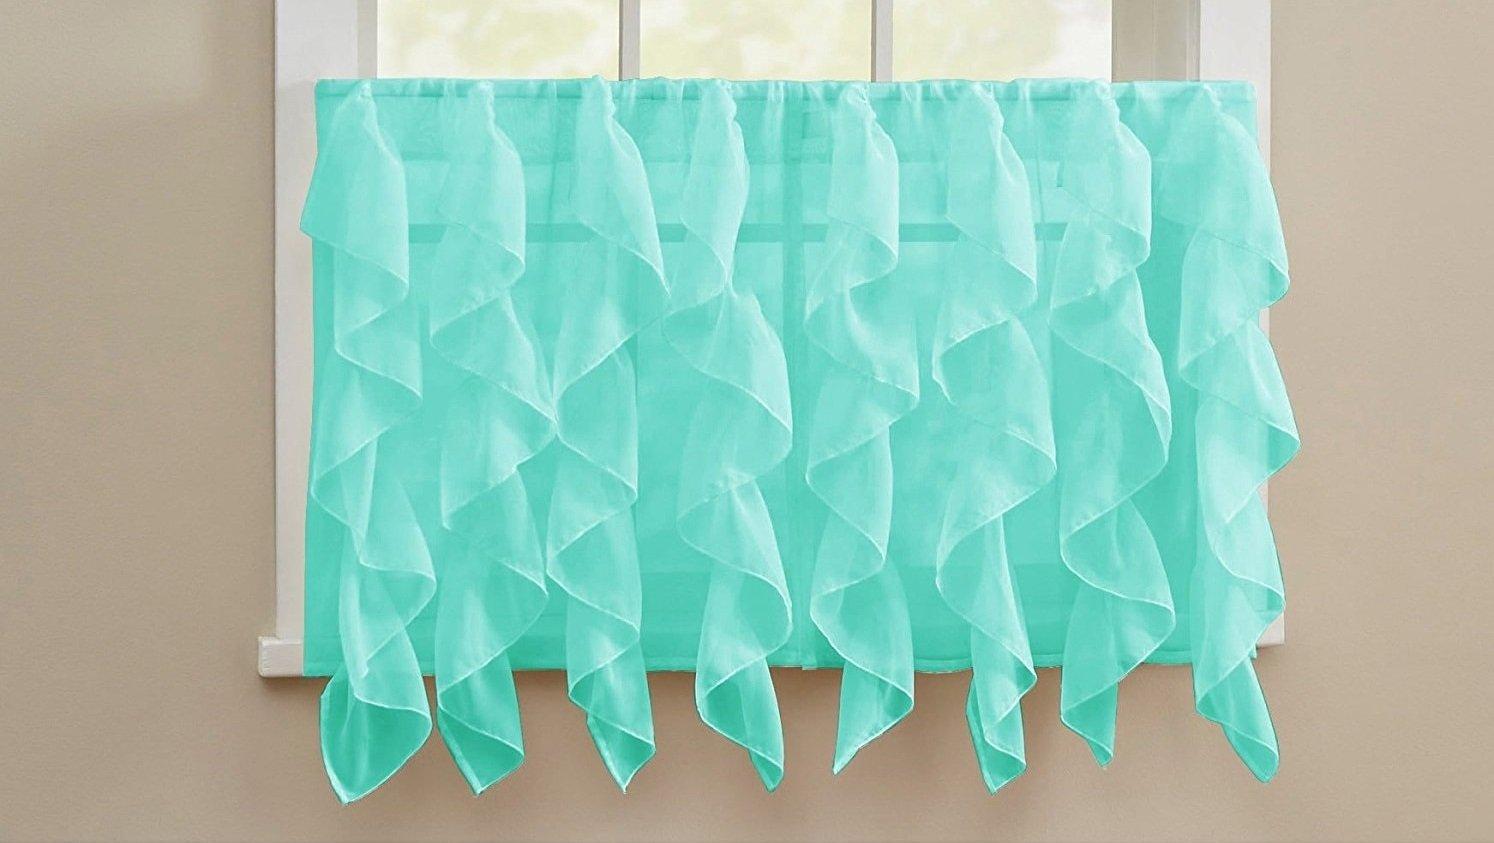 Lorraine Elegance Cascading Waterfall Ruffled Sheer Voile Kitchen Curtain Tier Pair (52'' x 24'') - Spa Blue